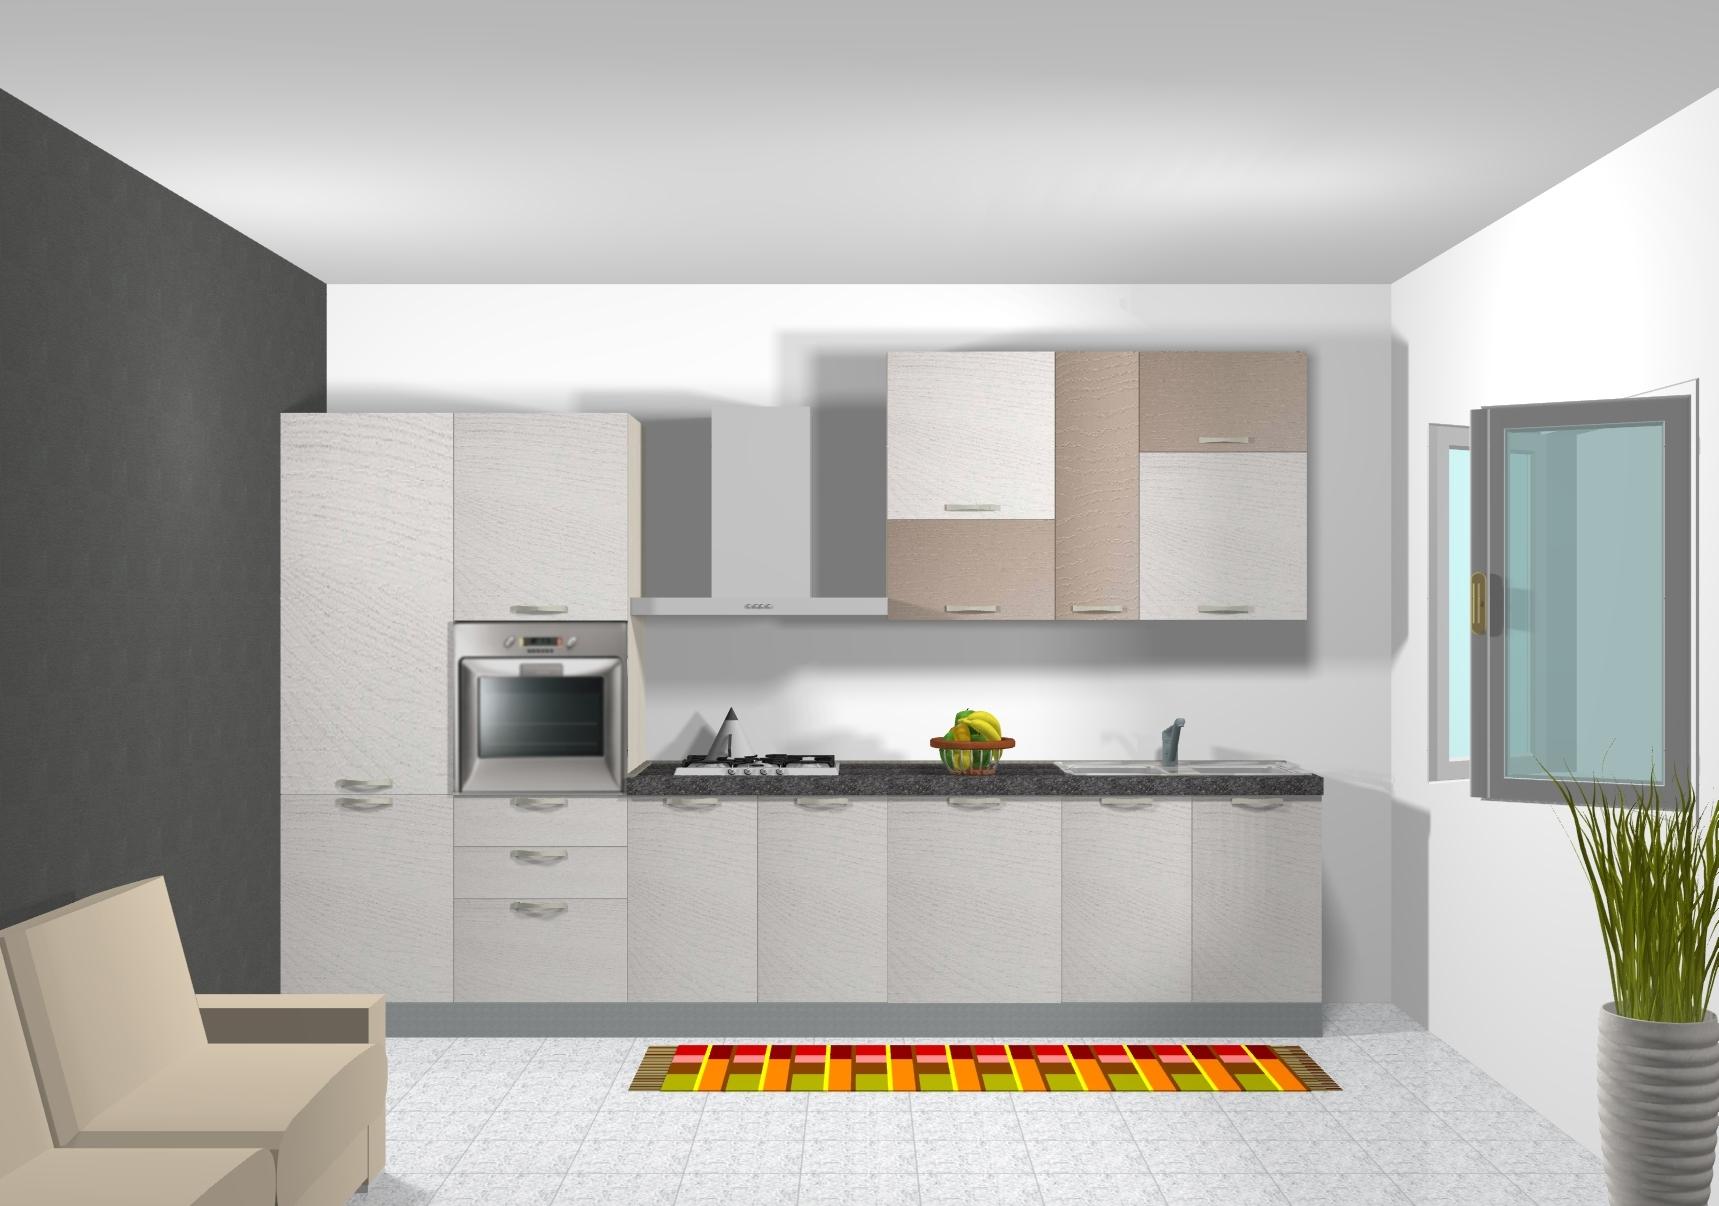 Cucine 3 Metri Lineari. Cucina Creo By Lube Britt L With Cucine 3 ...